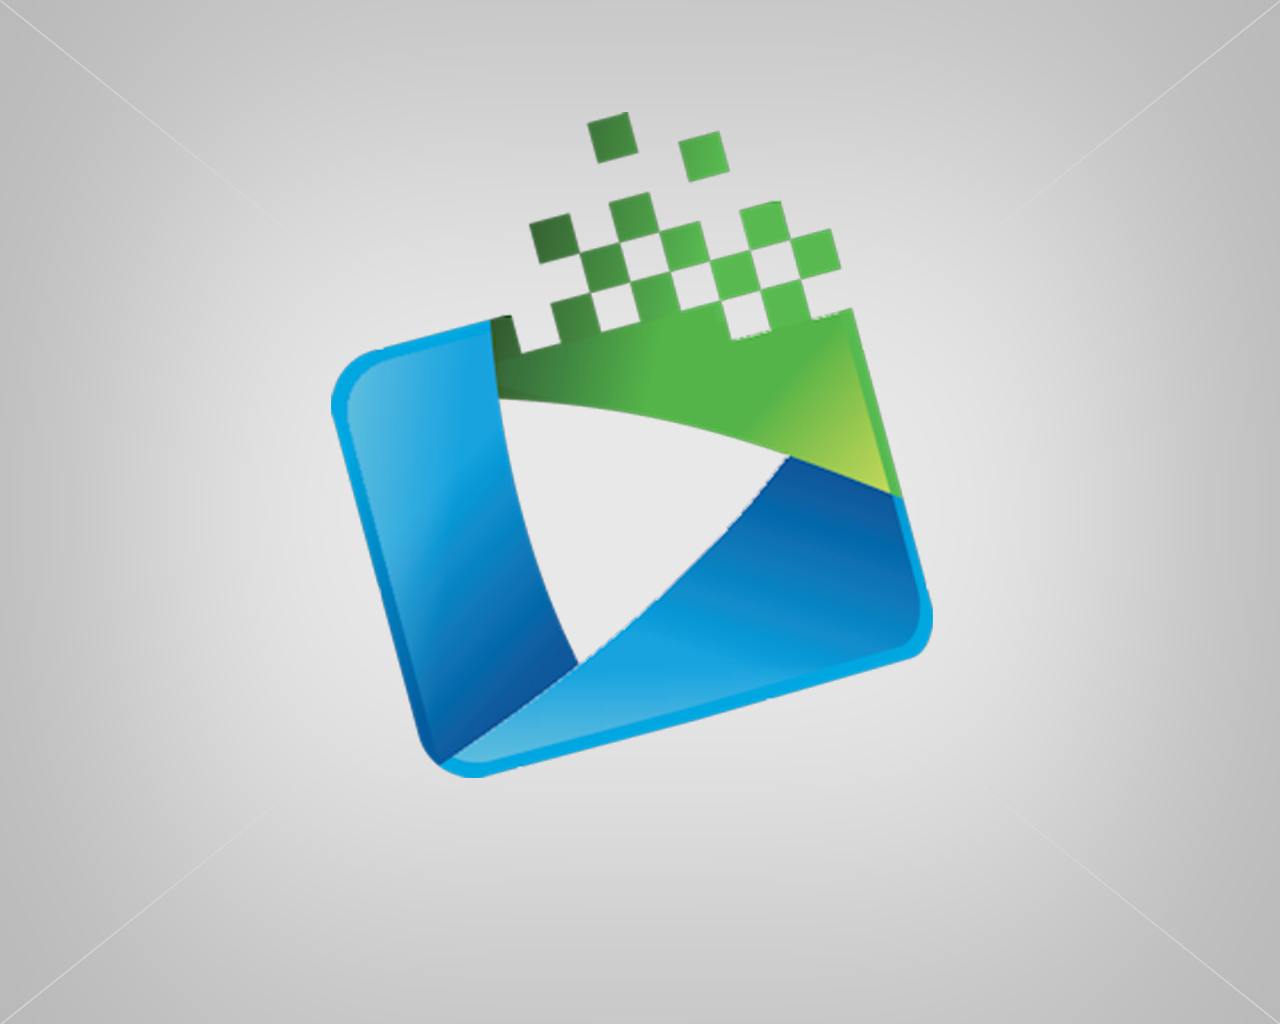 MetronomeSurveys - Fill Our Surveys v1 Brazil - Desktop